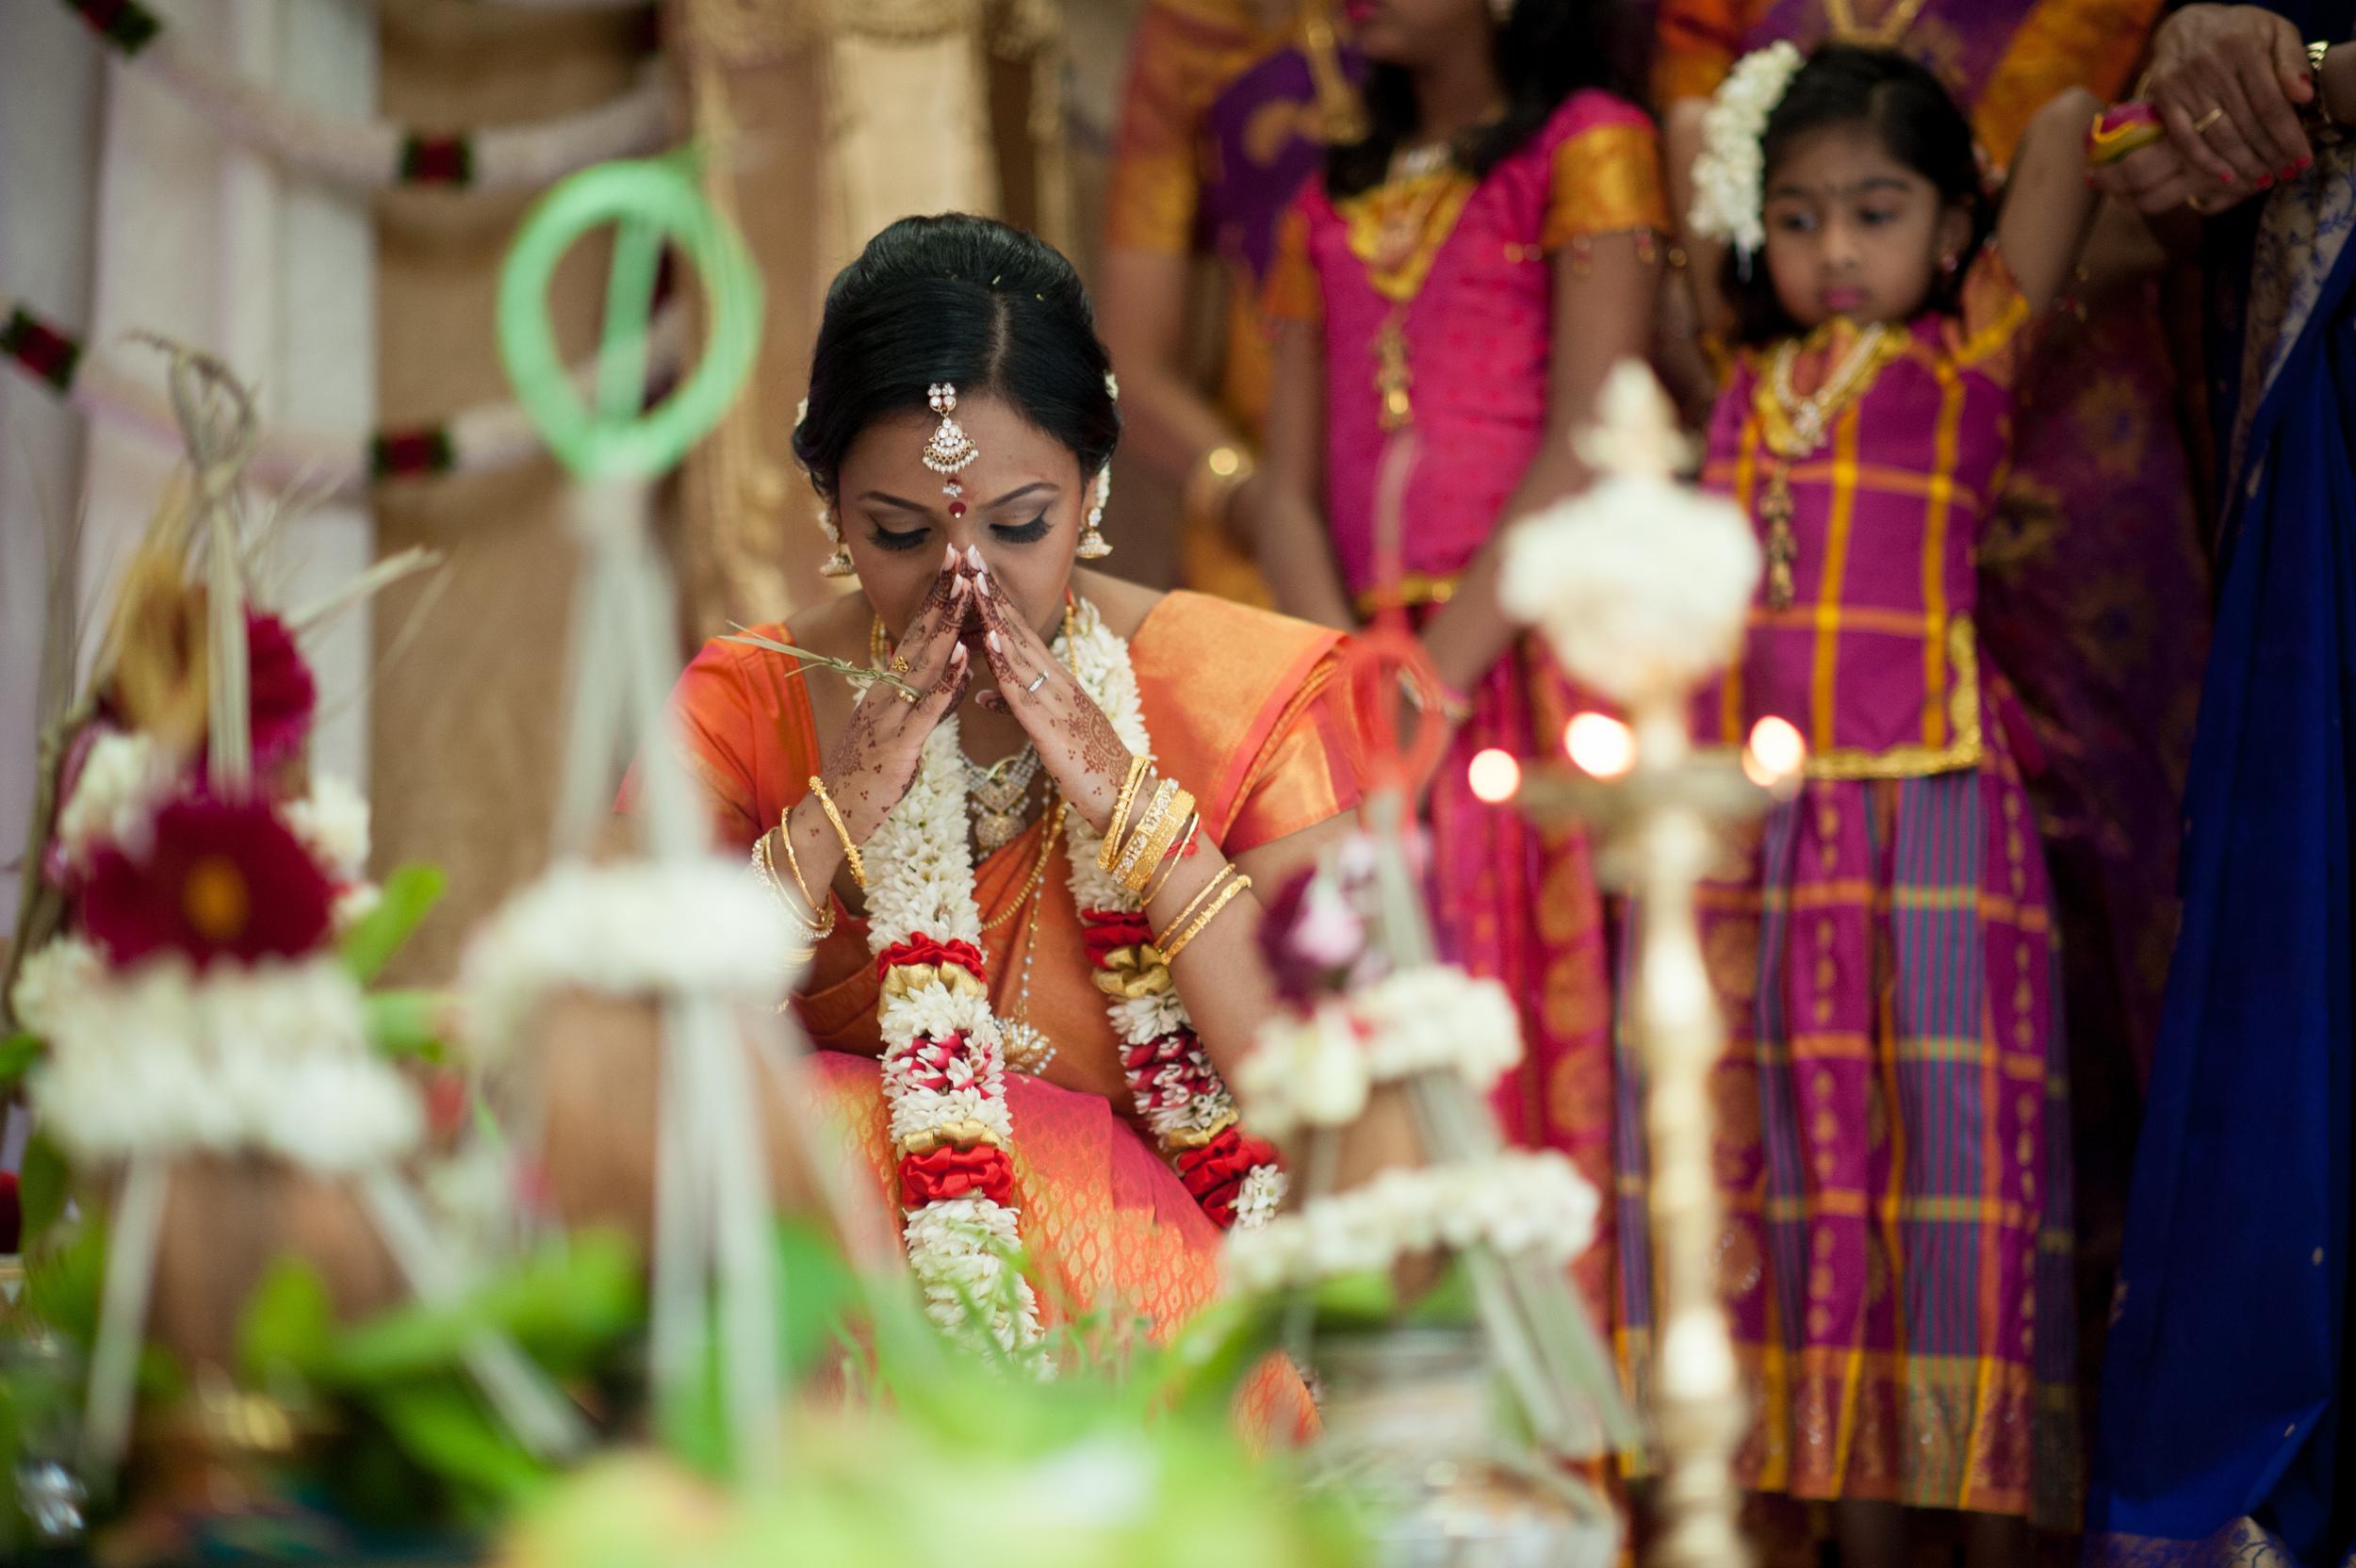 toronto-hindu-wedding-004.jpg